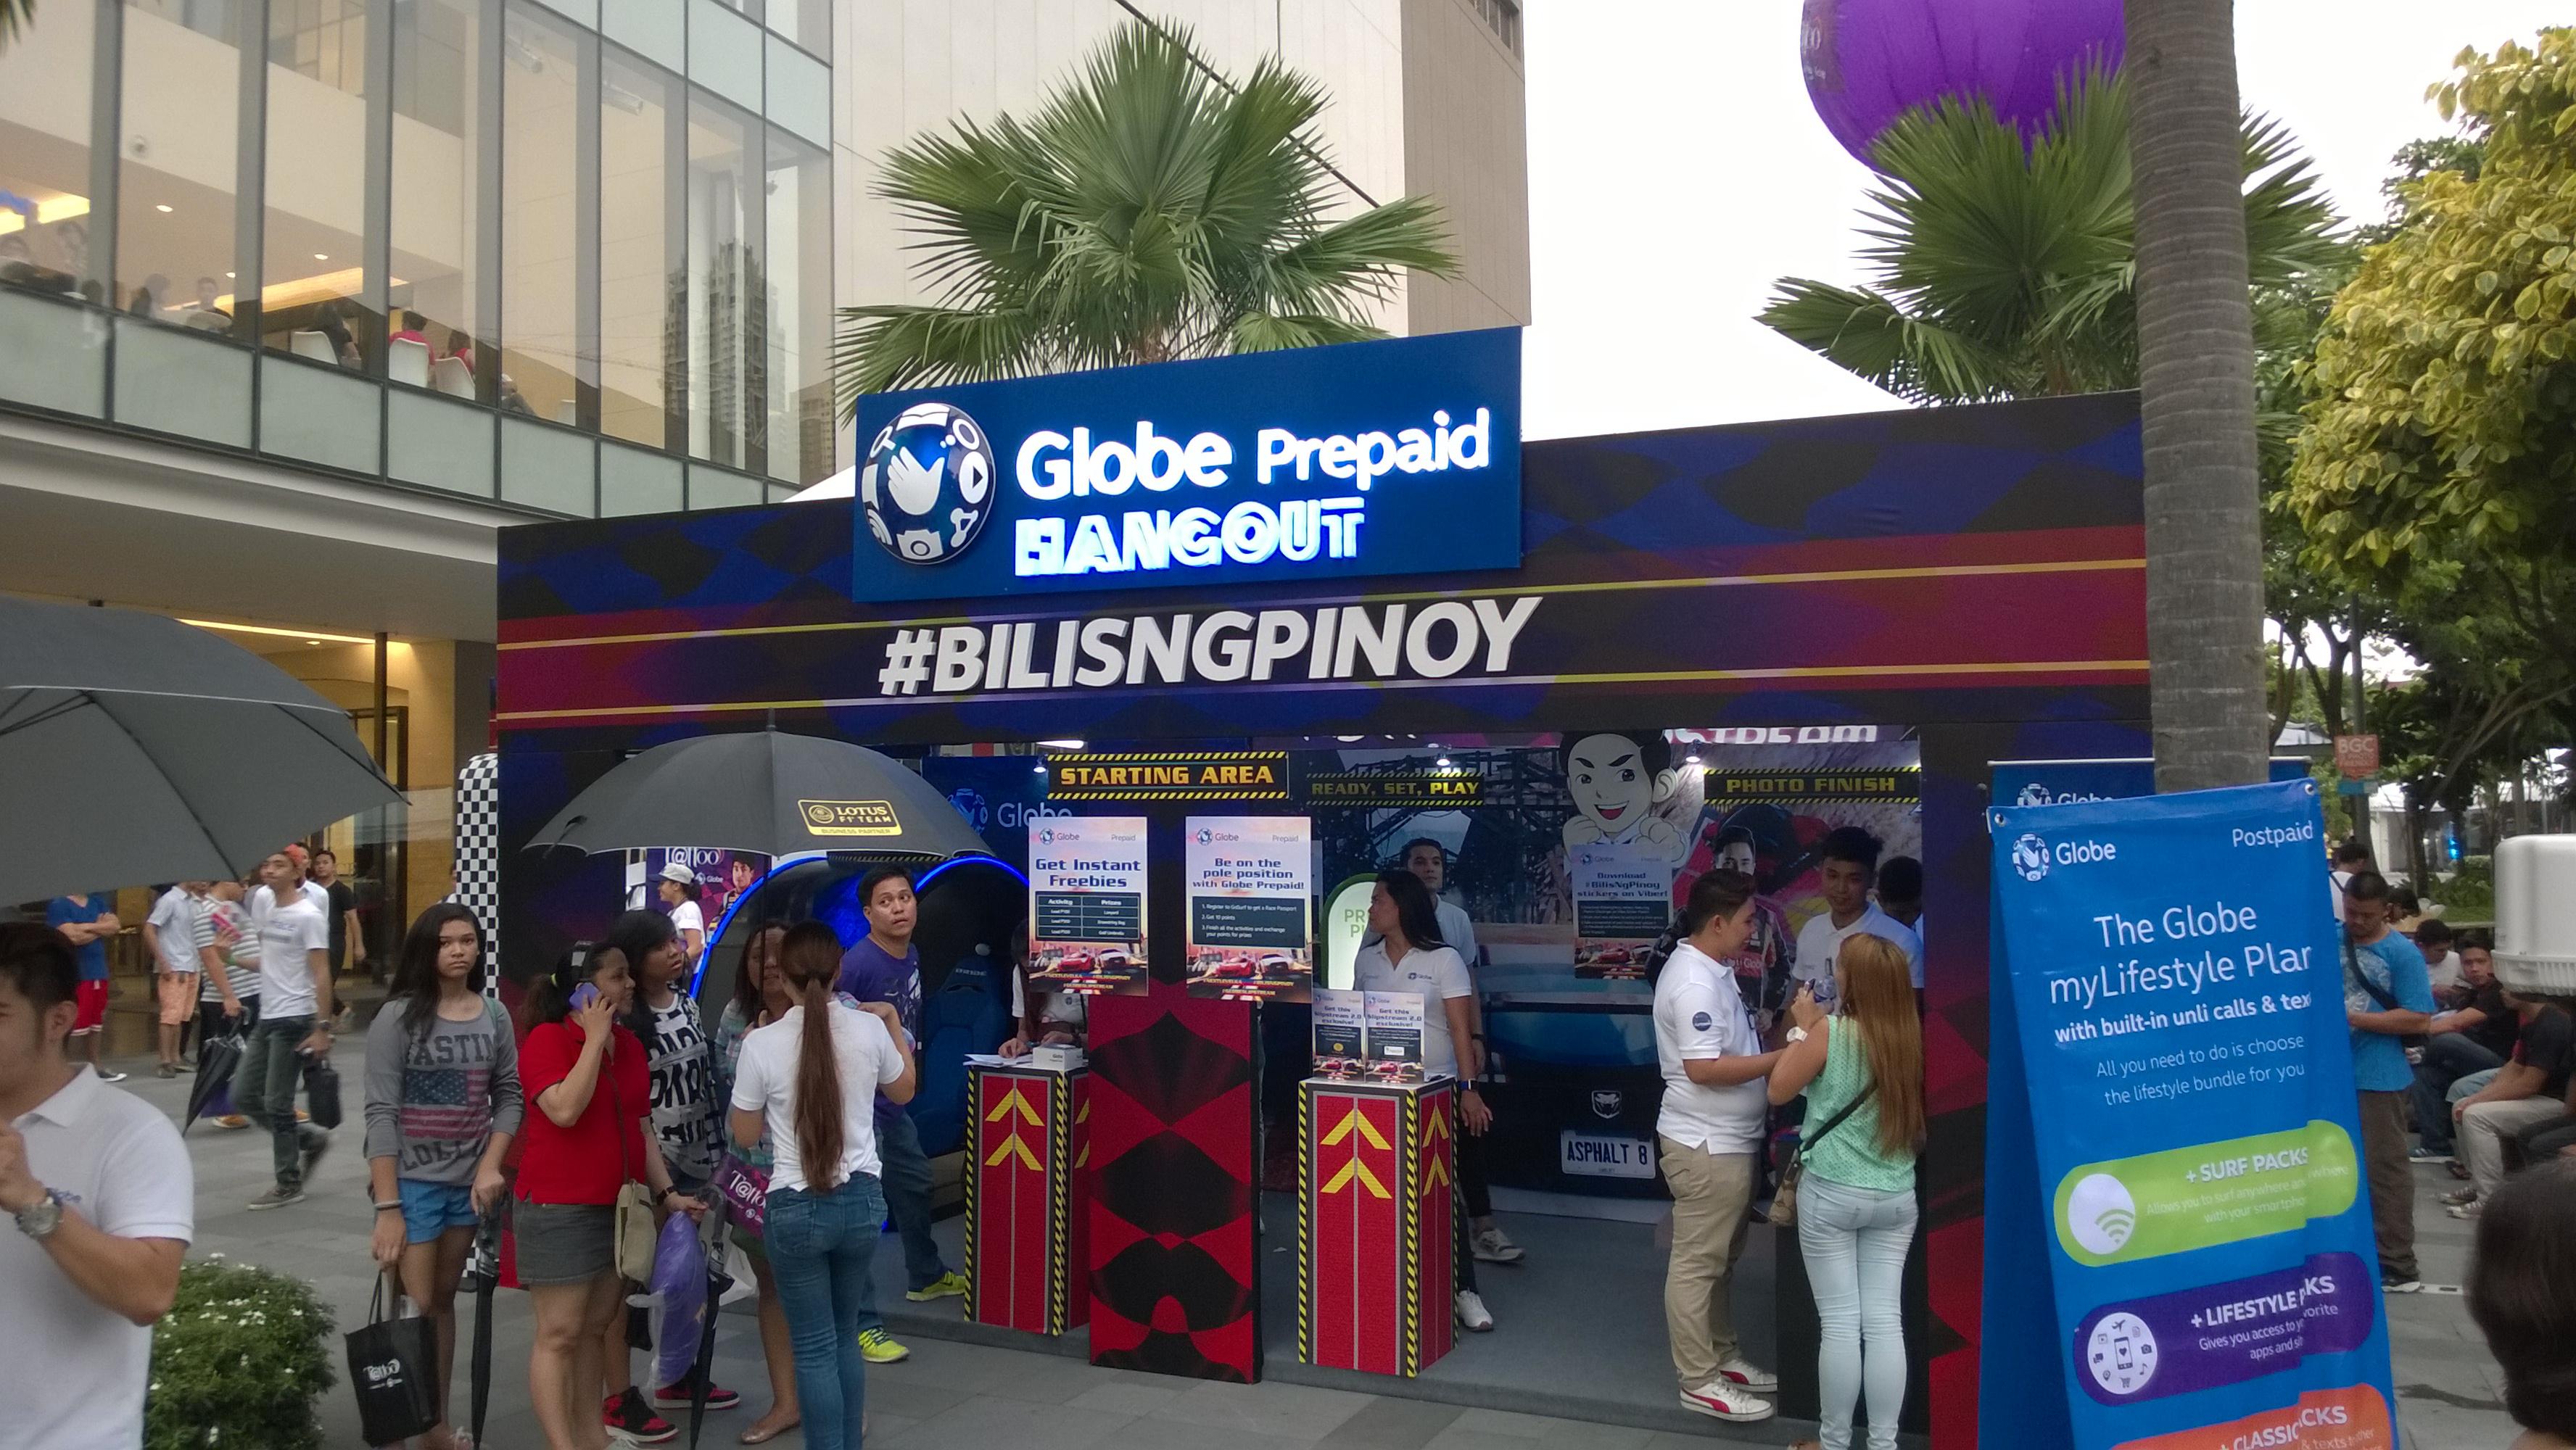 Globe Telecom Slip Stream Marlon Stockinger BGC Taguig Manila Philippines Duane Bacon Bilis Ng Pinoy Booth Prepaid